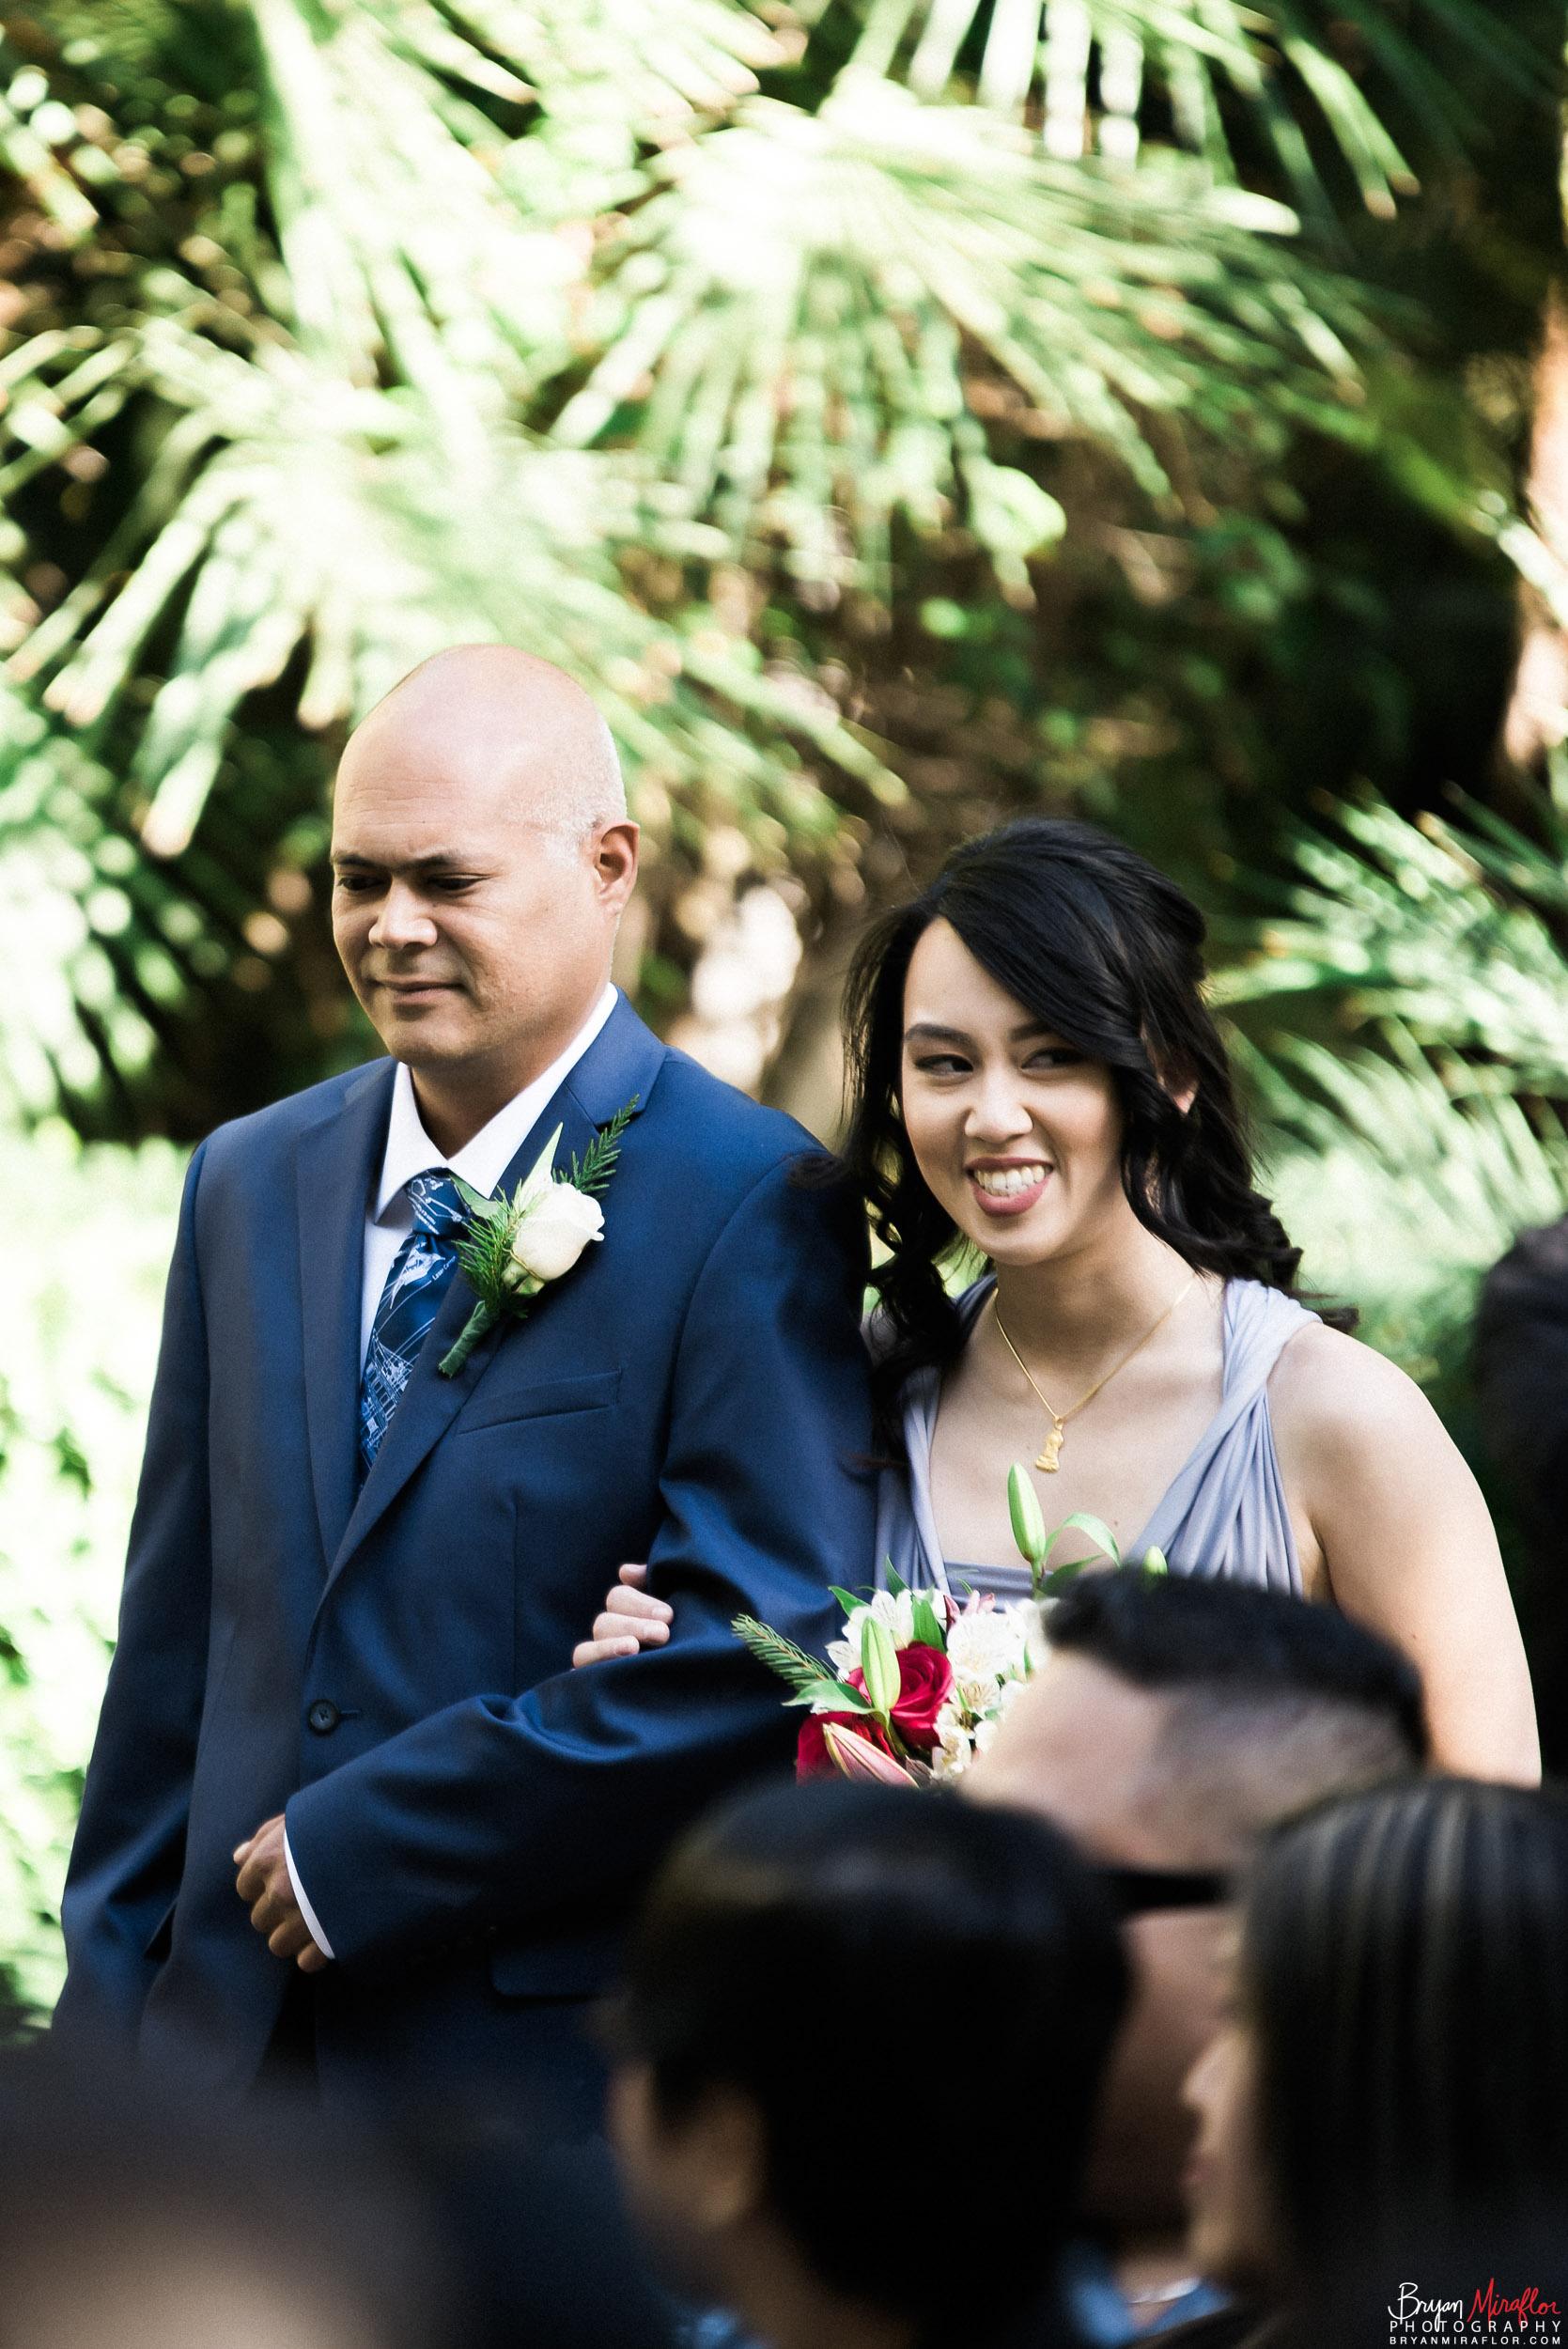 Bryan-Miraflor-Photography-Hannah-Jonathan-Married-Grand-Traditions-Estate-Gardens-Fallbrook-20171222-083.jpg